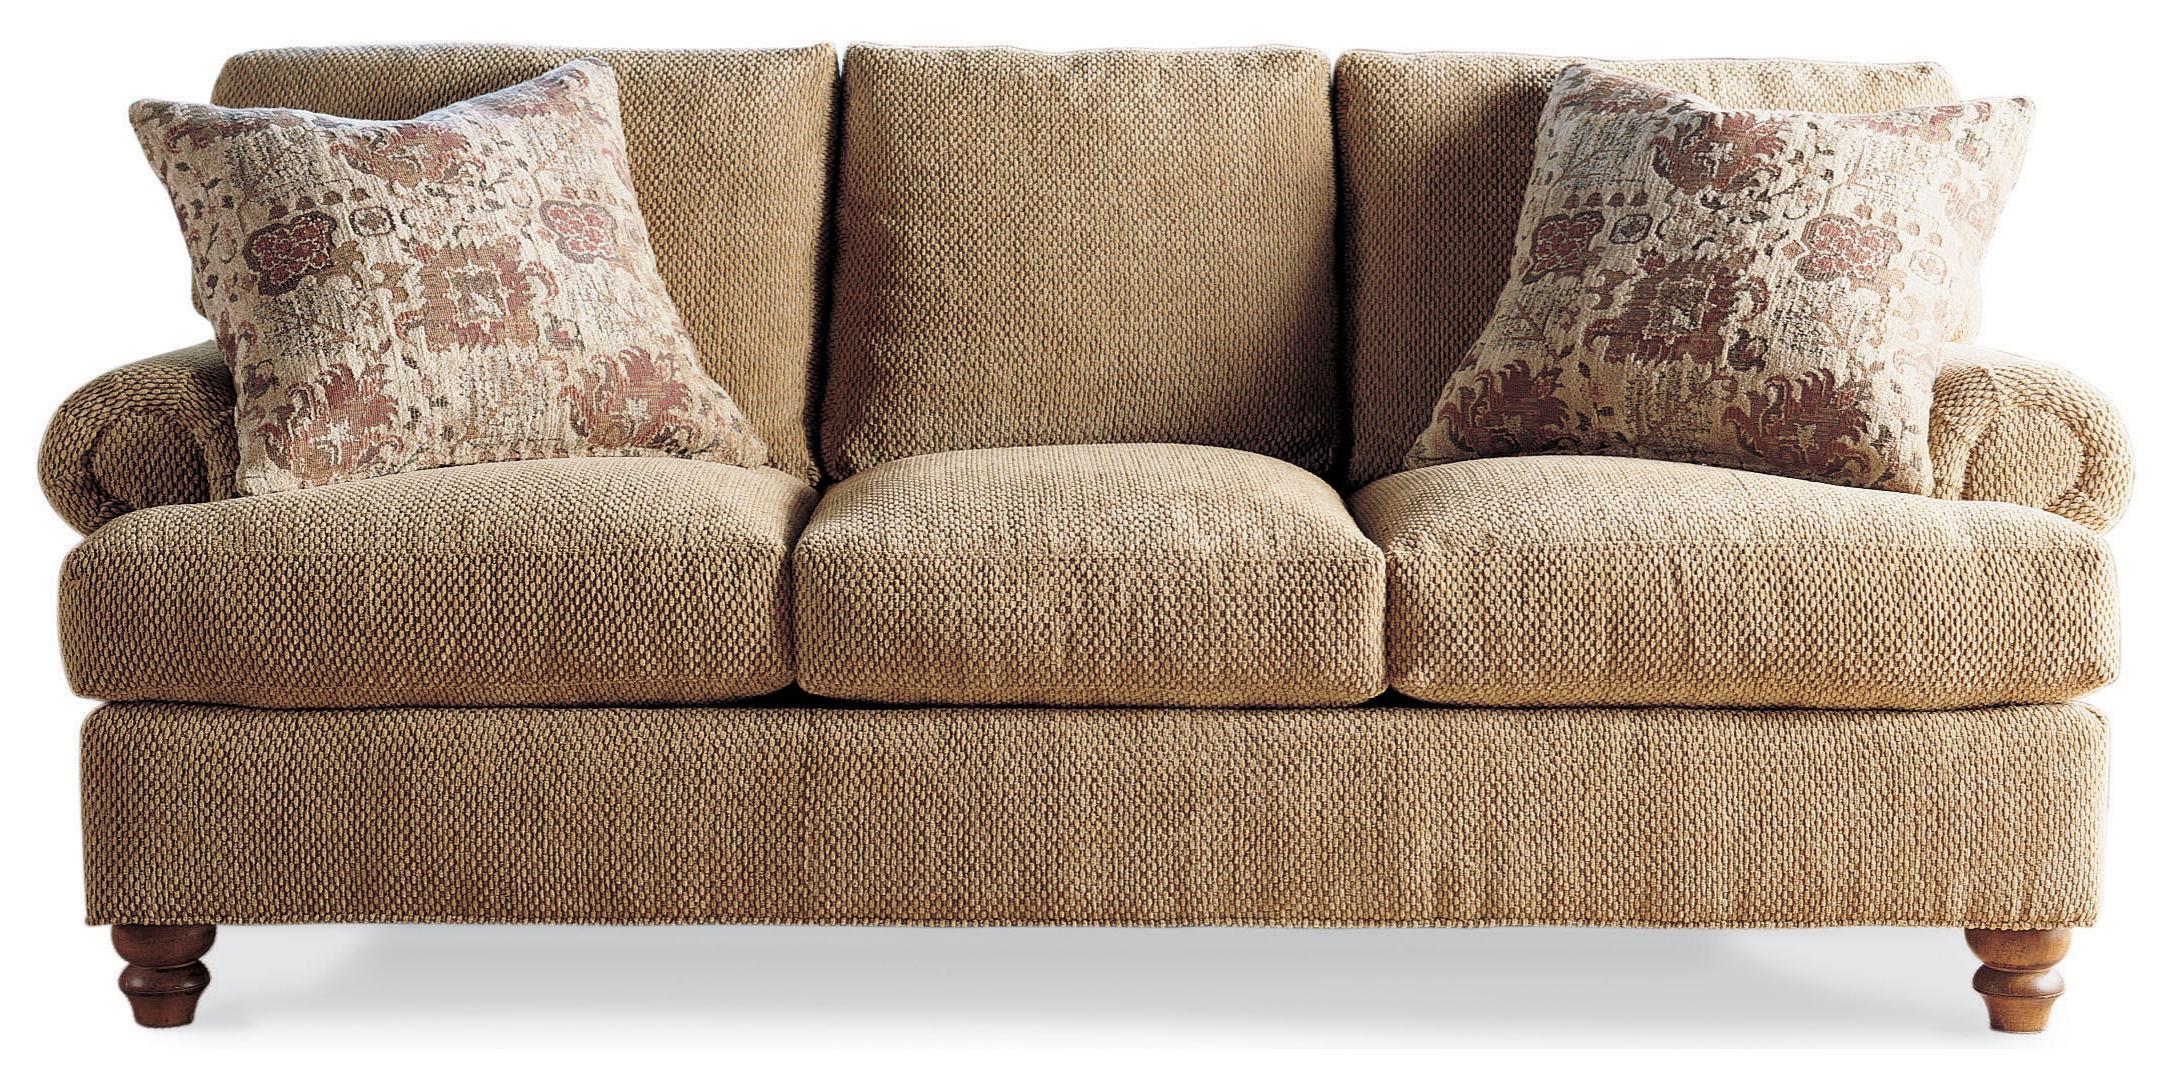 Drexel Sofas Drexel Heritage Upholstery Dhu By Baer S